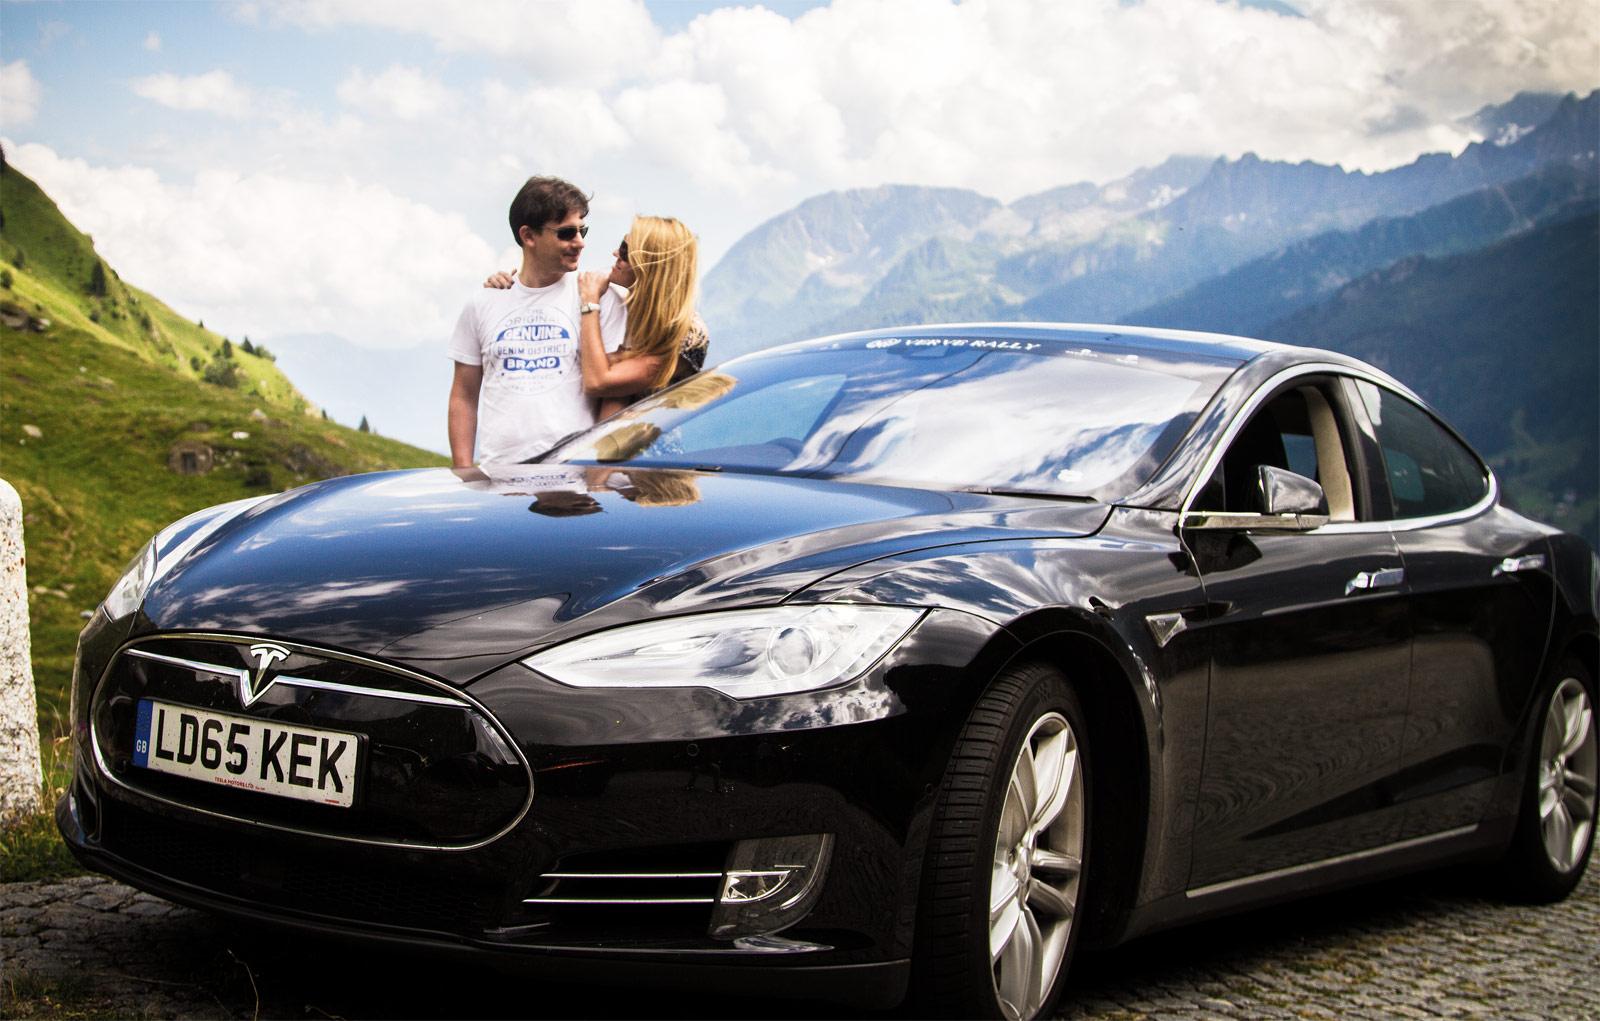 Verve Luxury Car Rally Across Europe